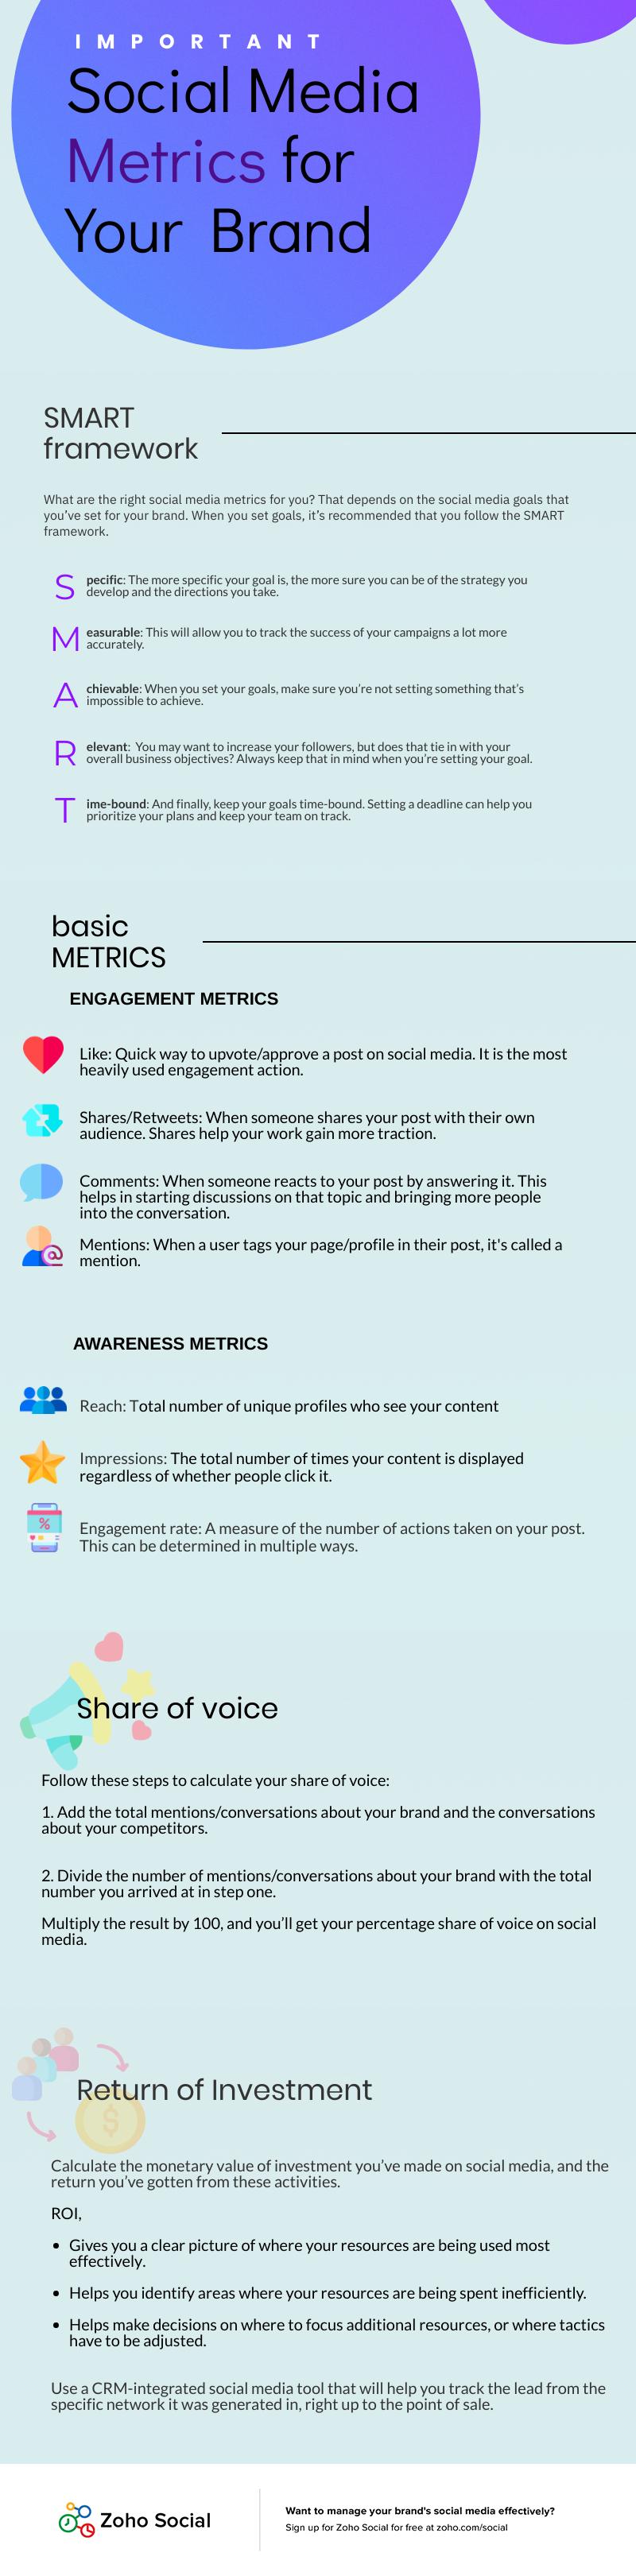 important social media metrics for reports